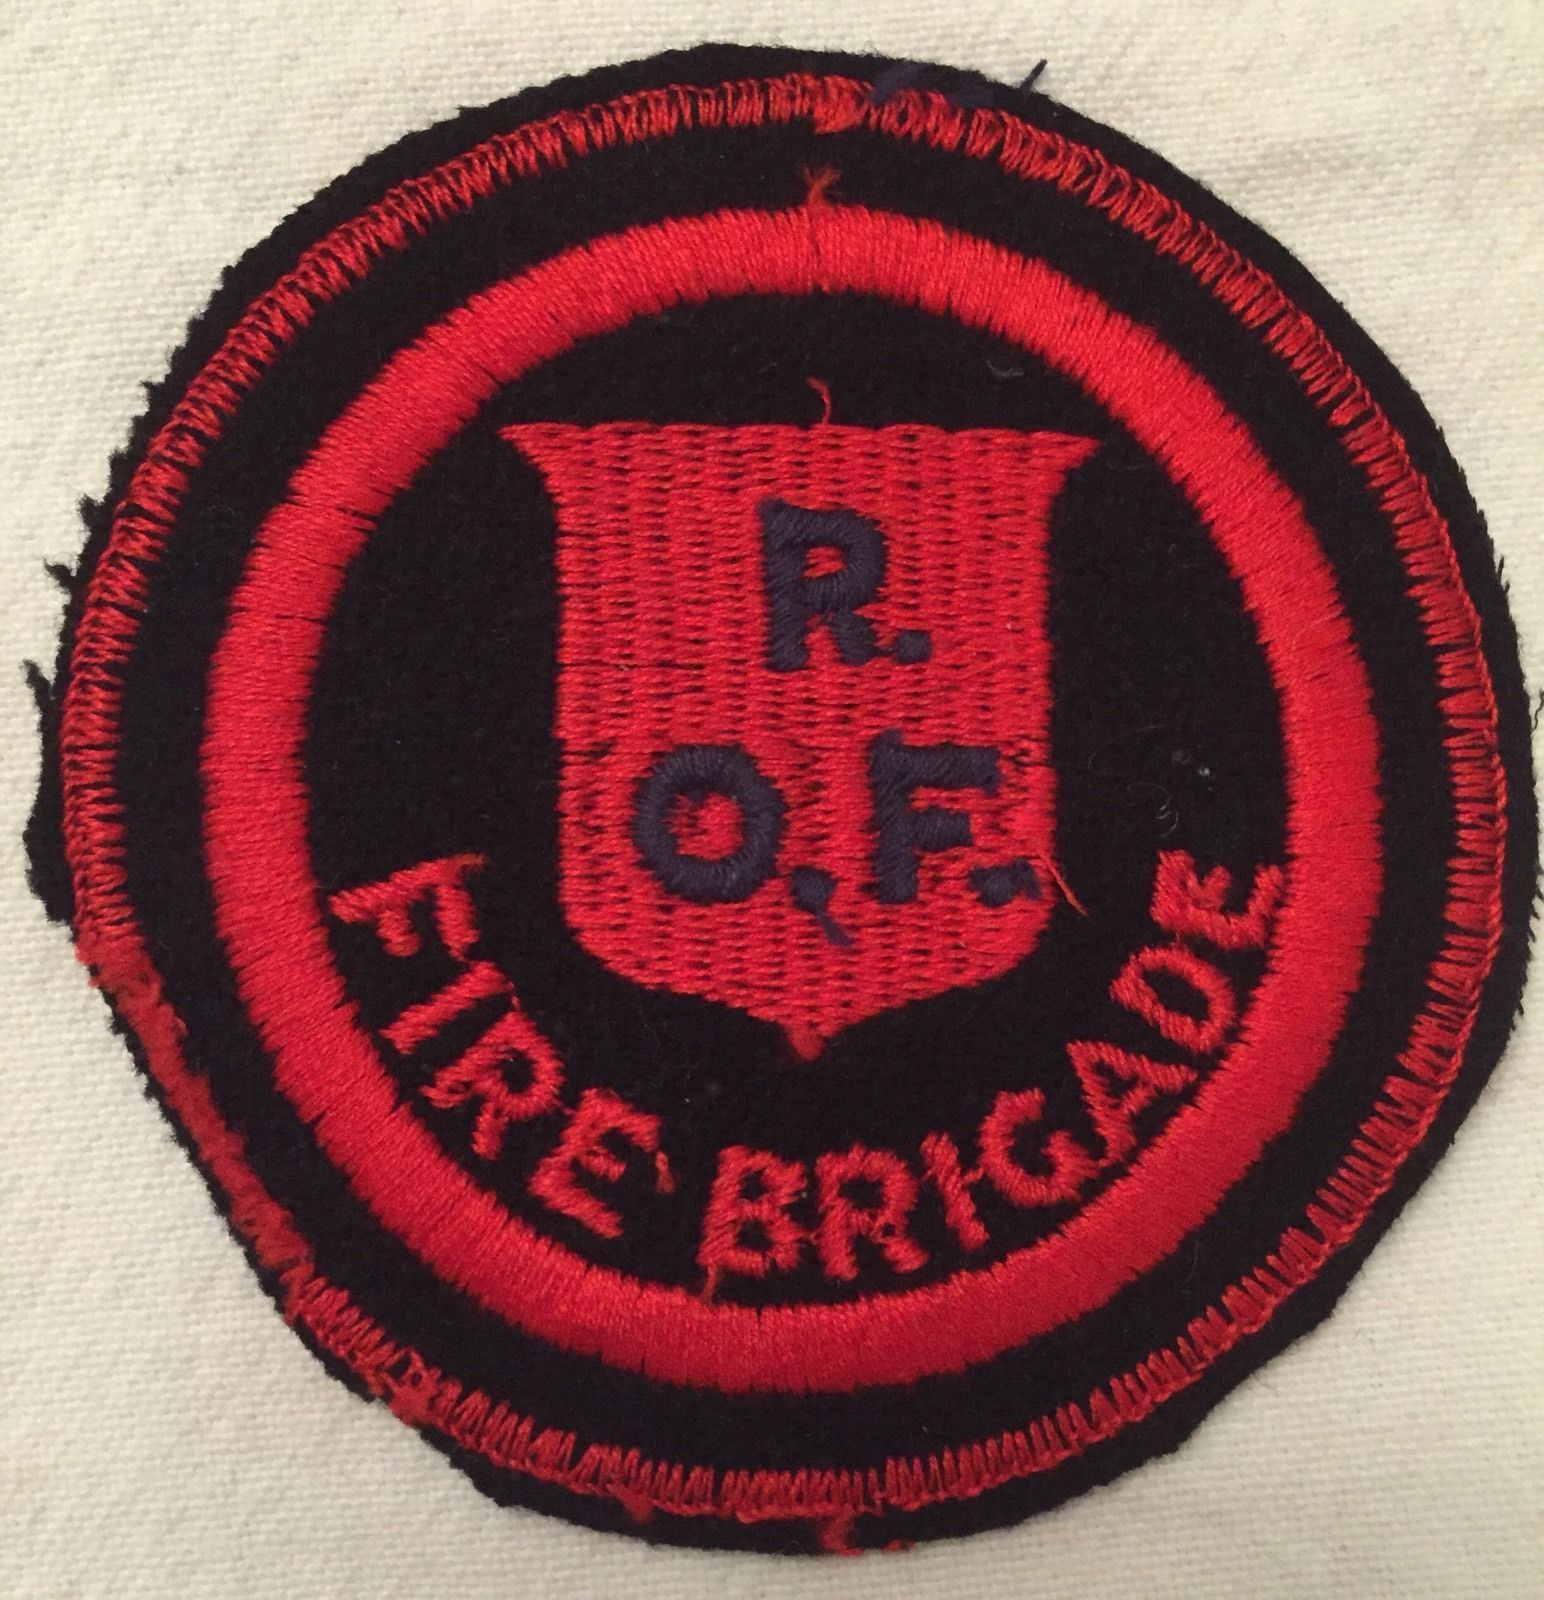 1940's Royal Ordnance Factory Fire Brigade cloth Badge | eBay